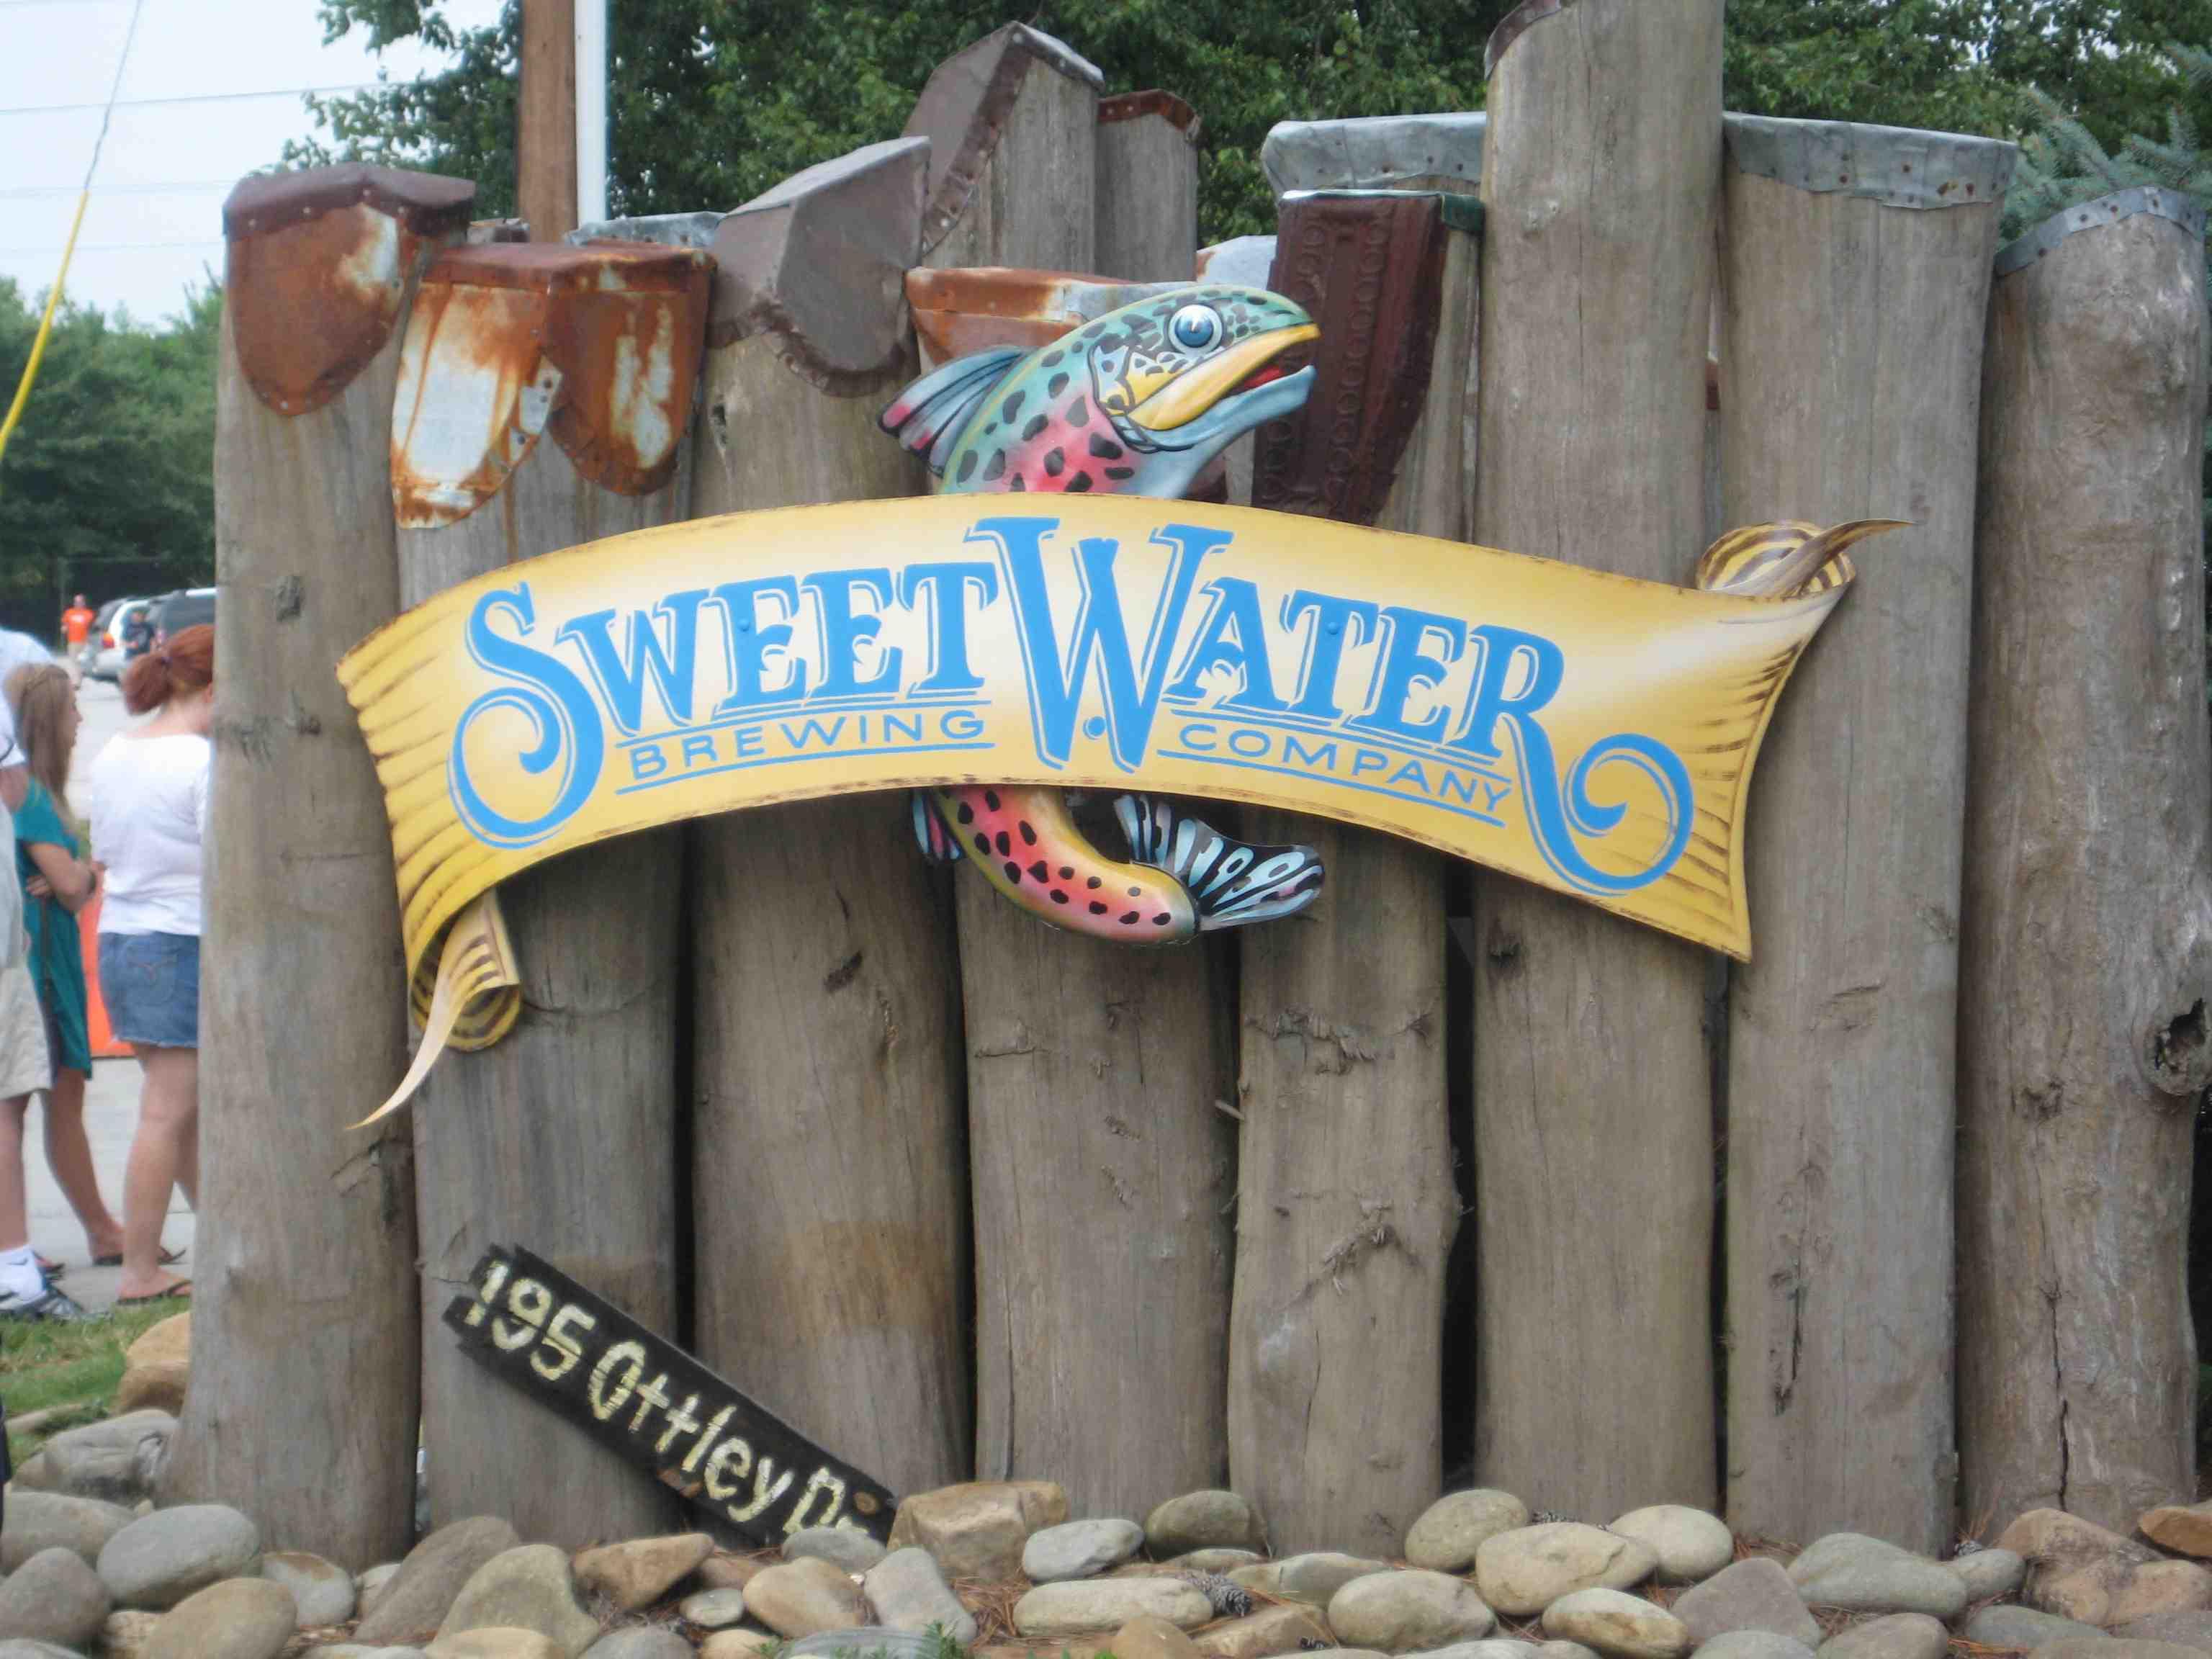 Sweetwater Brewery Tour Review, Atlanta, GA - Roamilicious